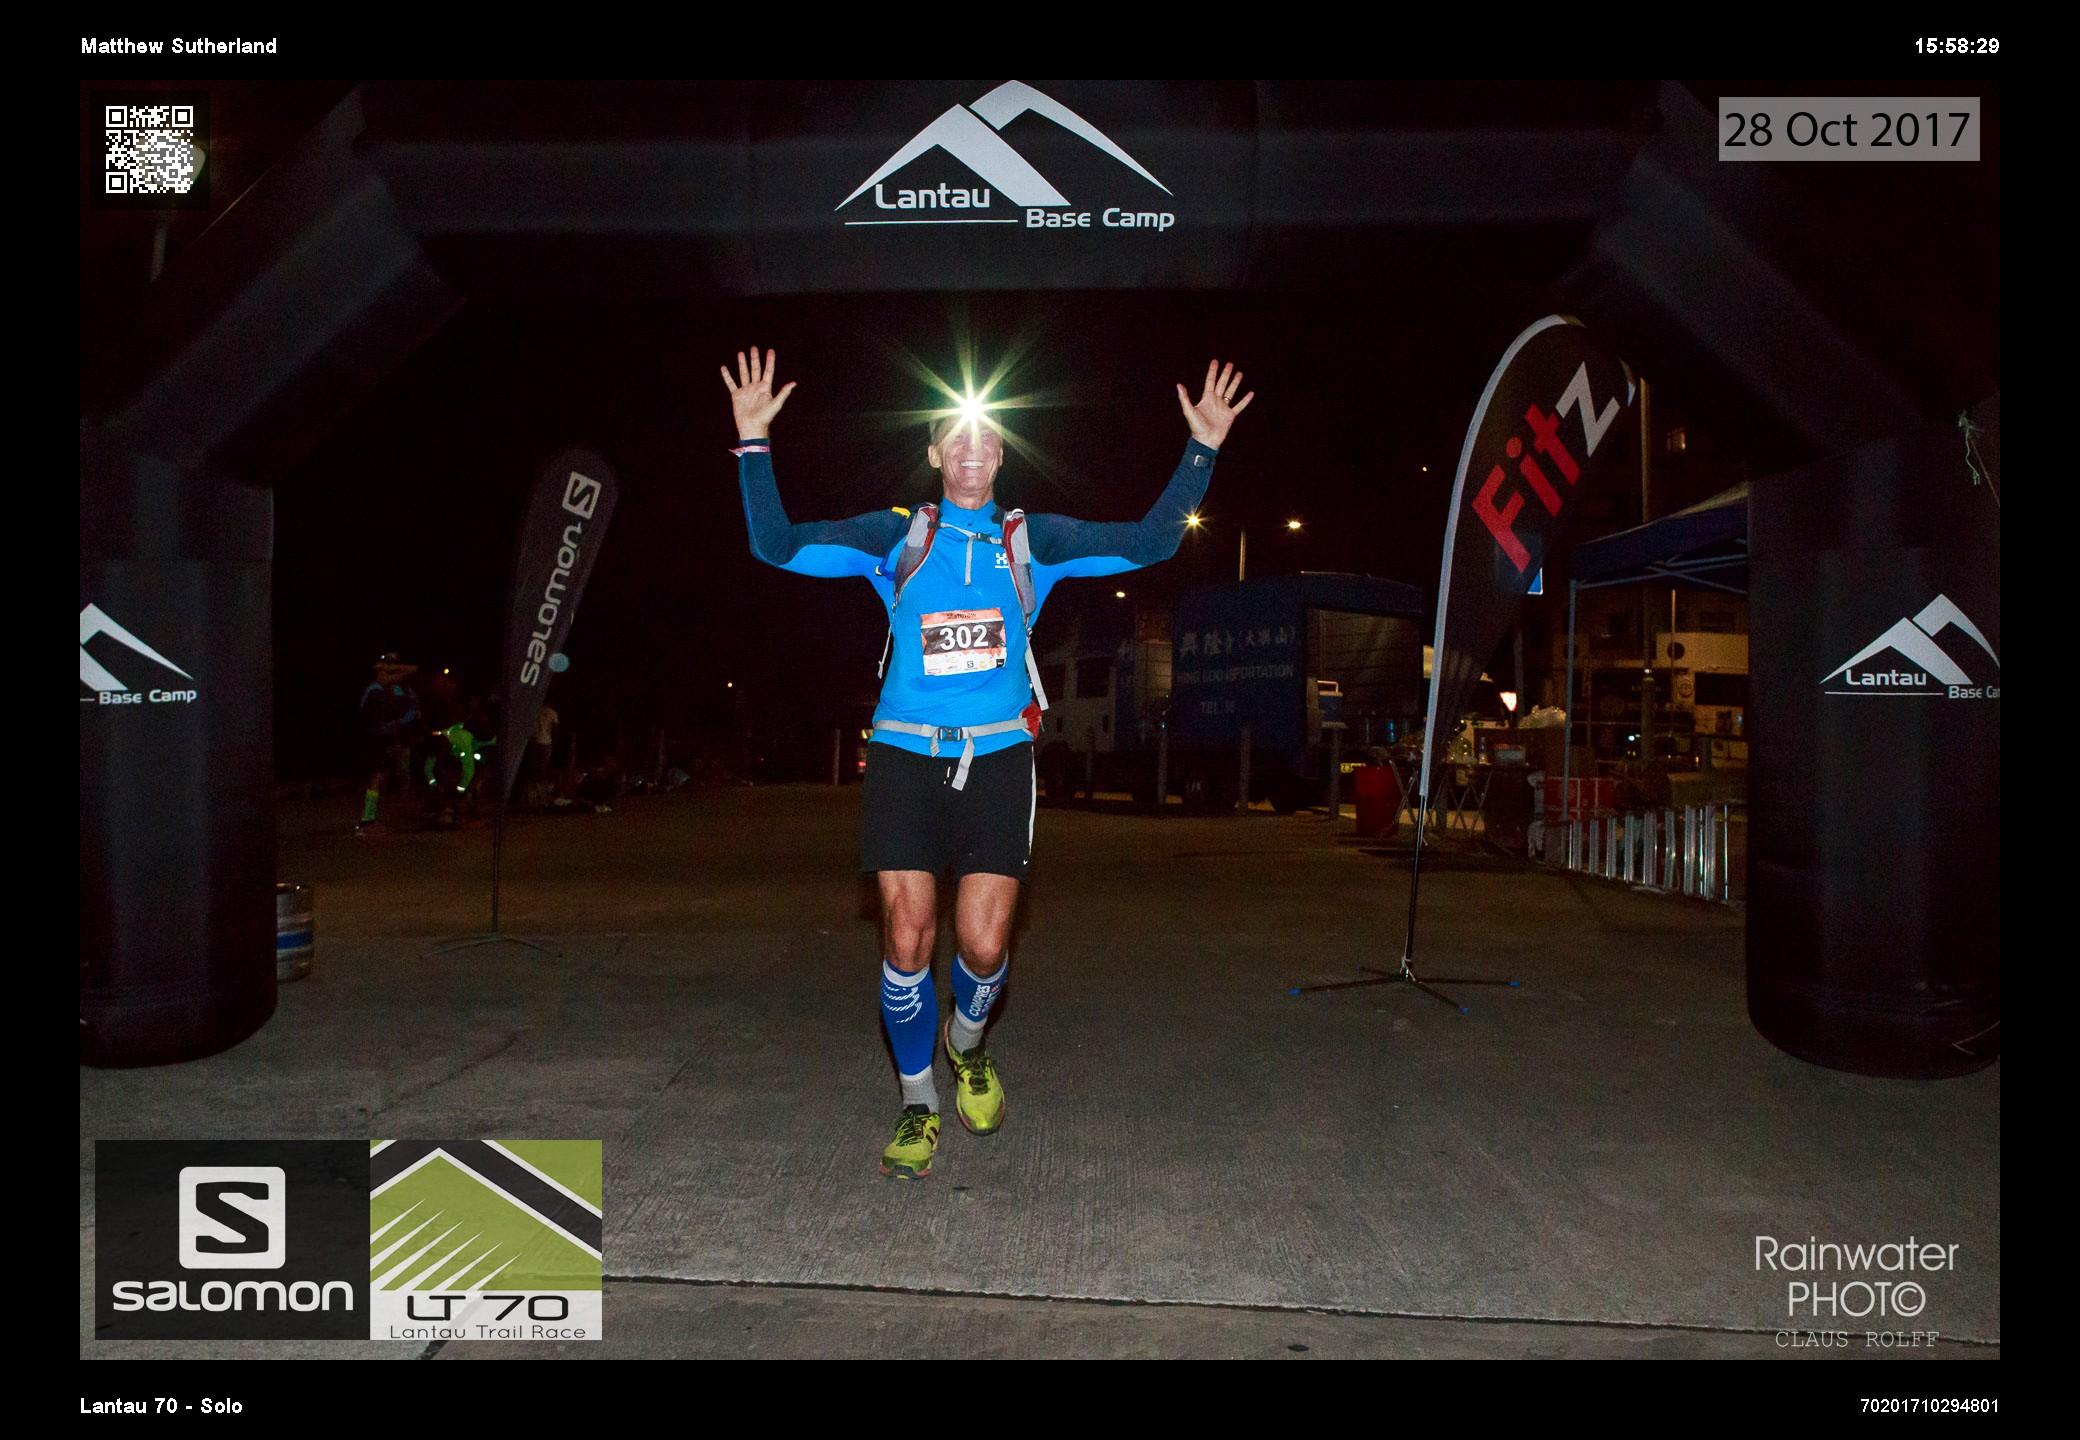 Matthew Sutherland cross the finish line